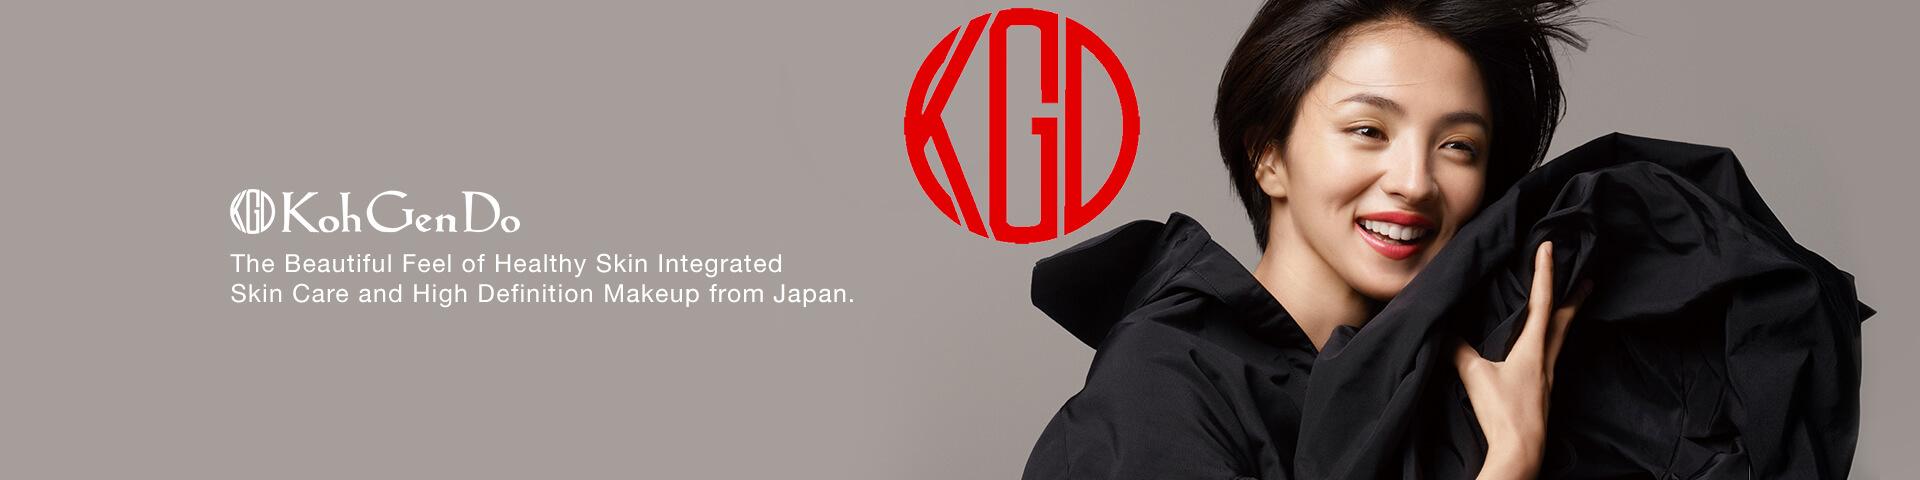 KGD Flagship Top Banner